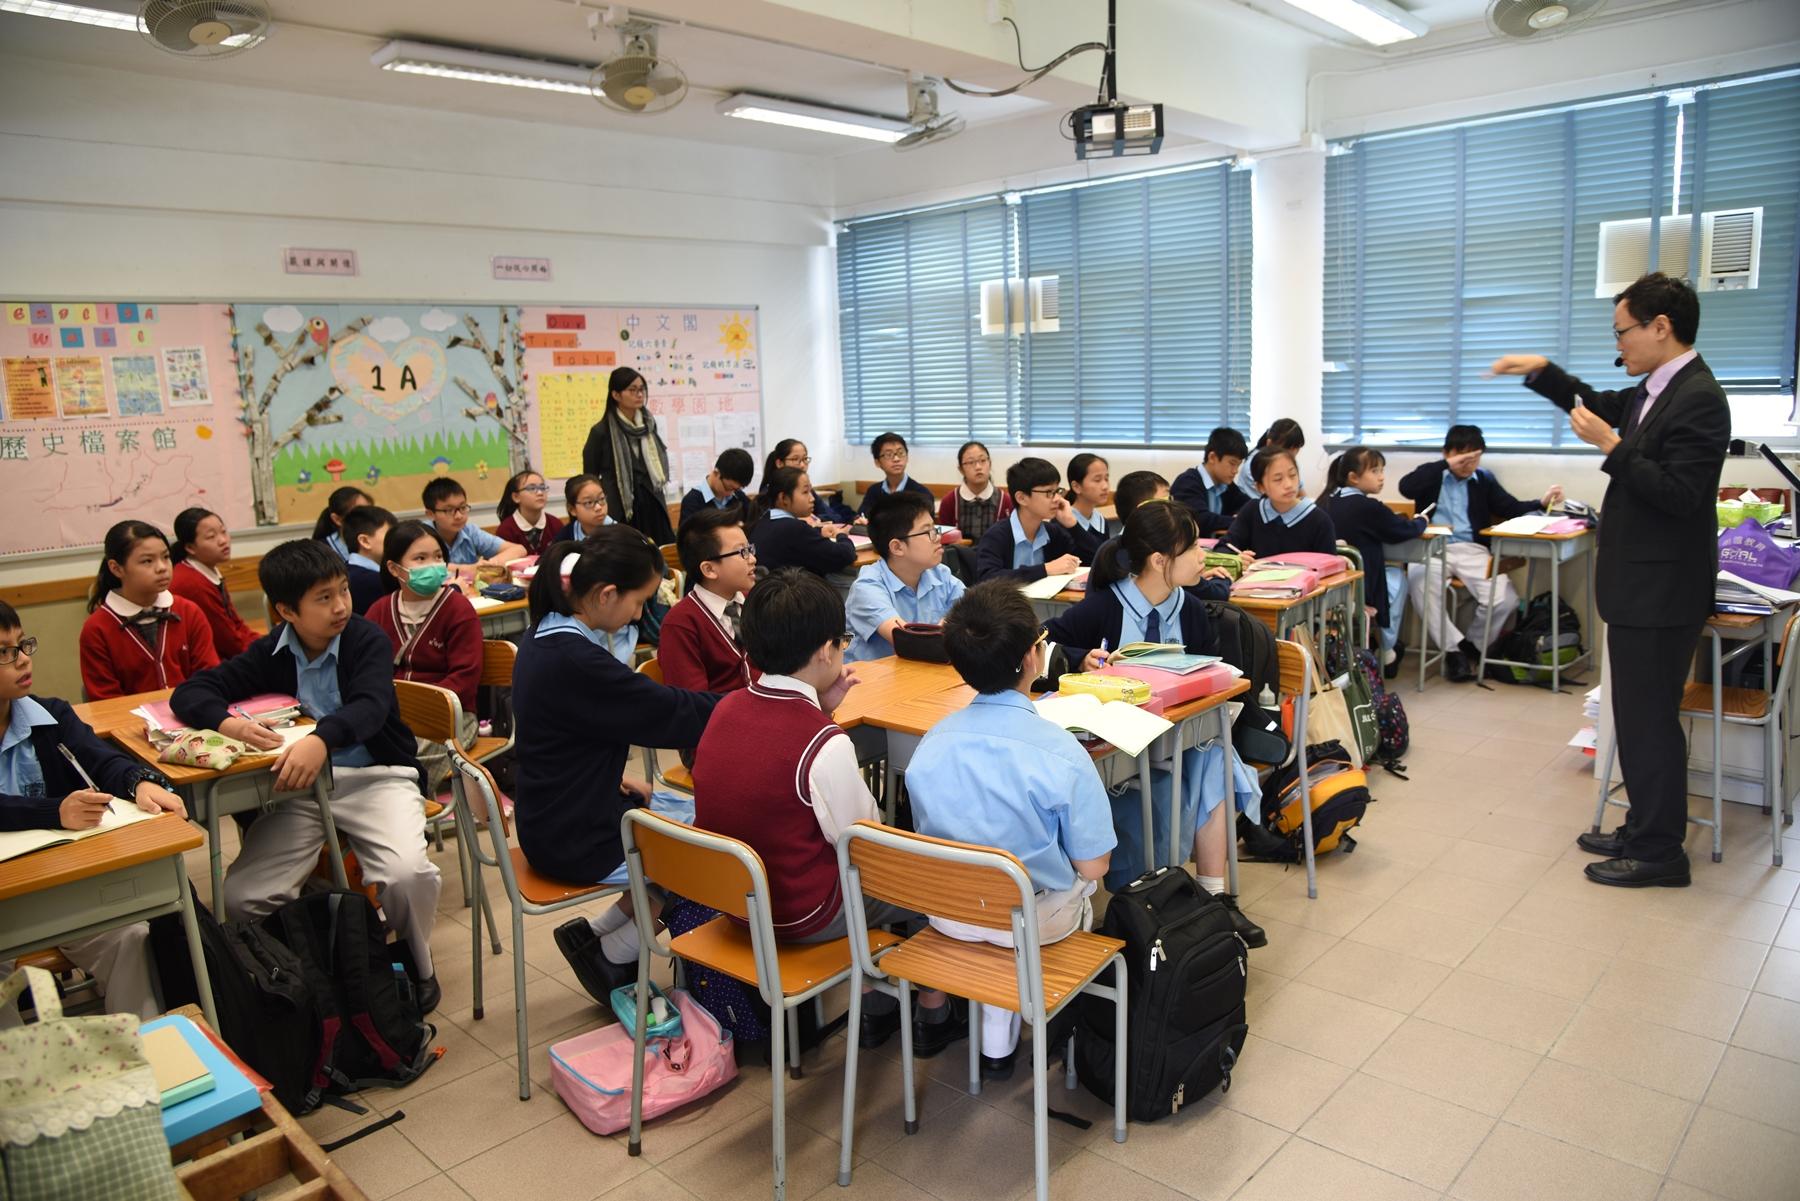 http://npc.edu.hk/sites/default/files/dsc_4992.jpg